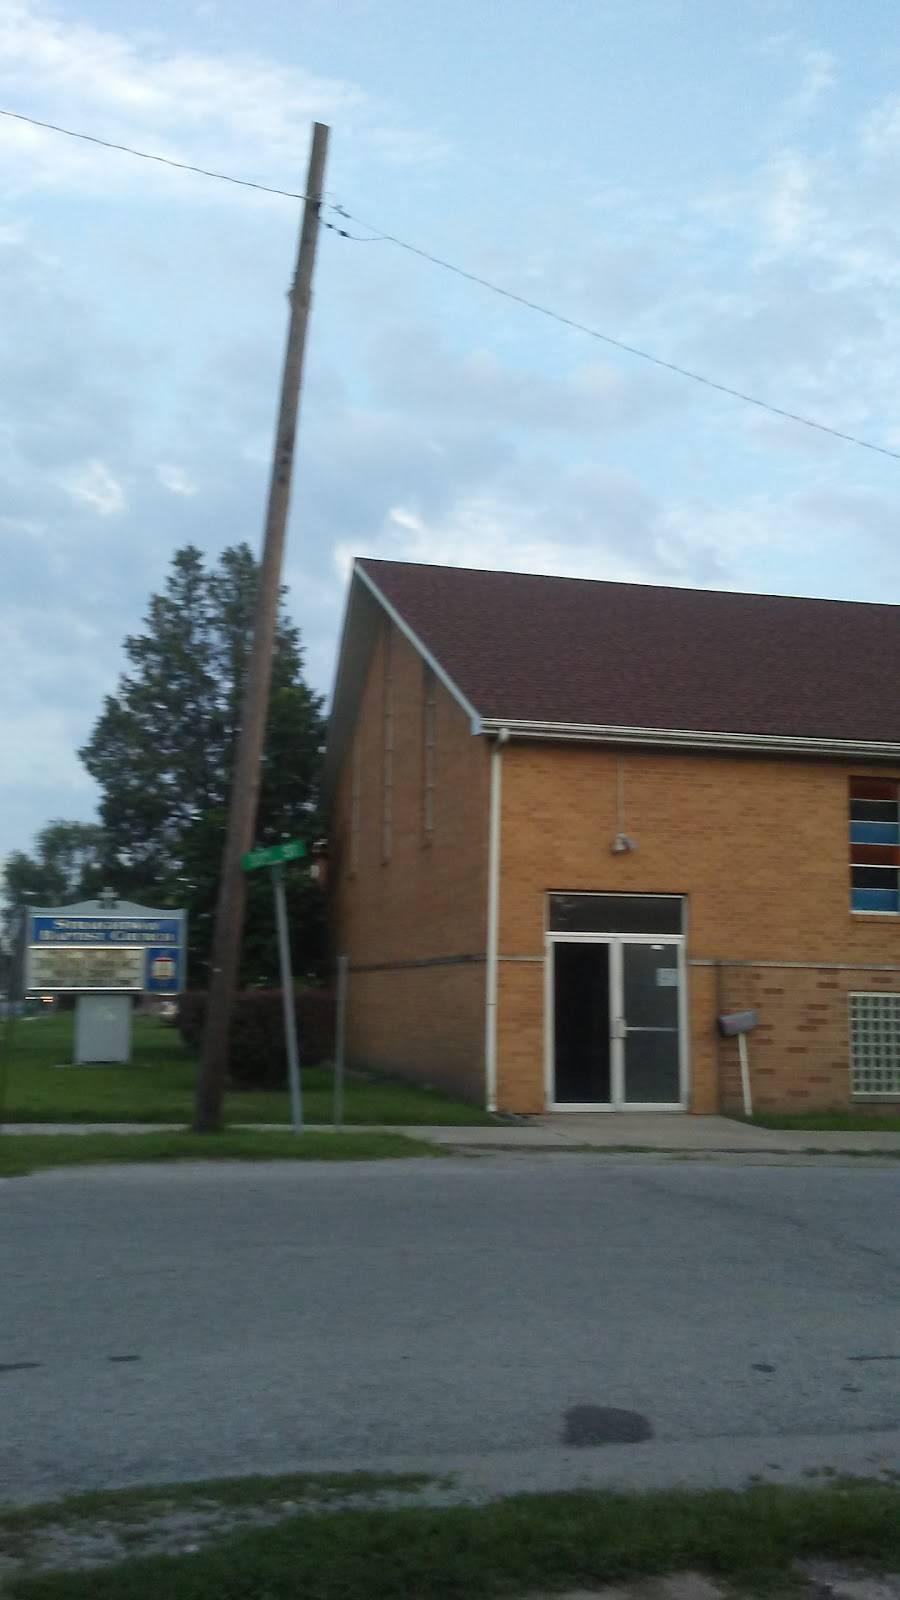 Straightway Baptist Church - church    Photo 1 of 1   Address: 3300 Bond Ave, East St Louis, IL 62207, USA   Phone: (618) 875-4378